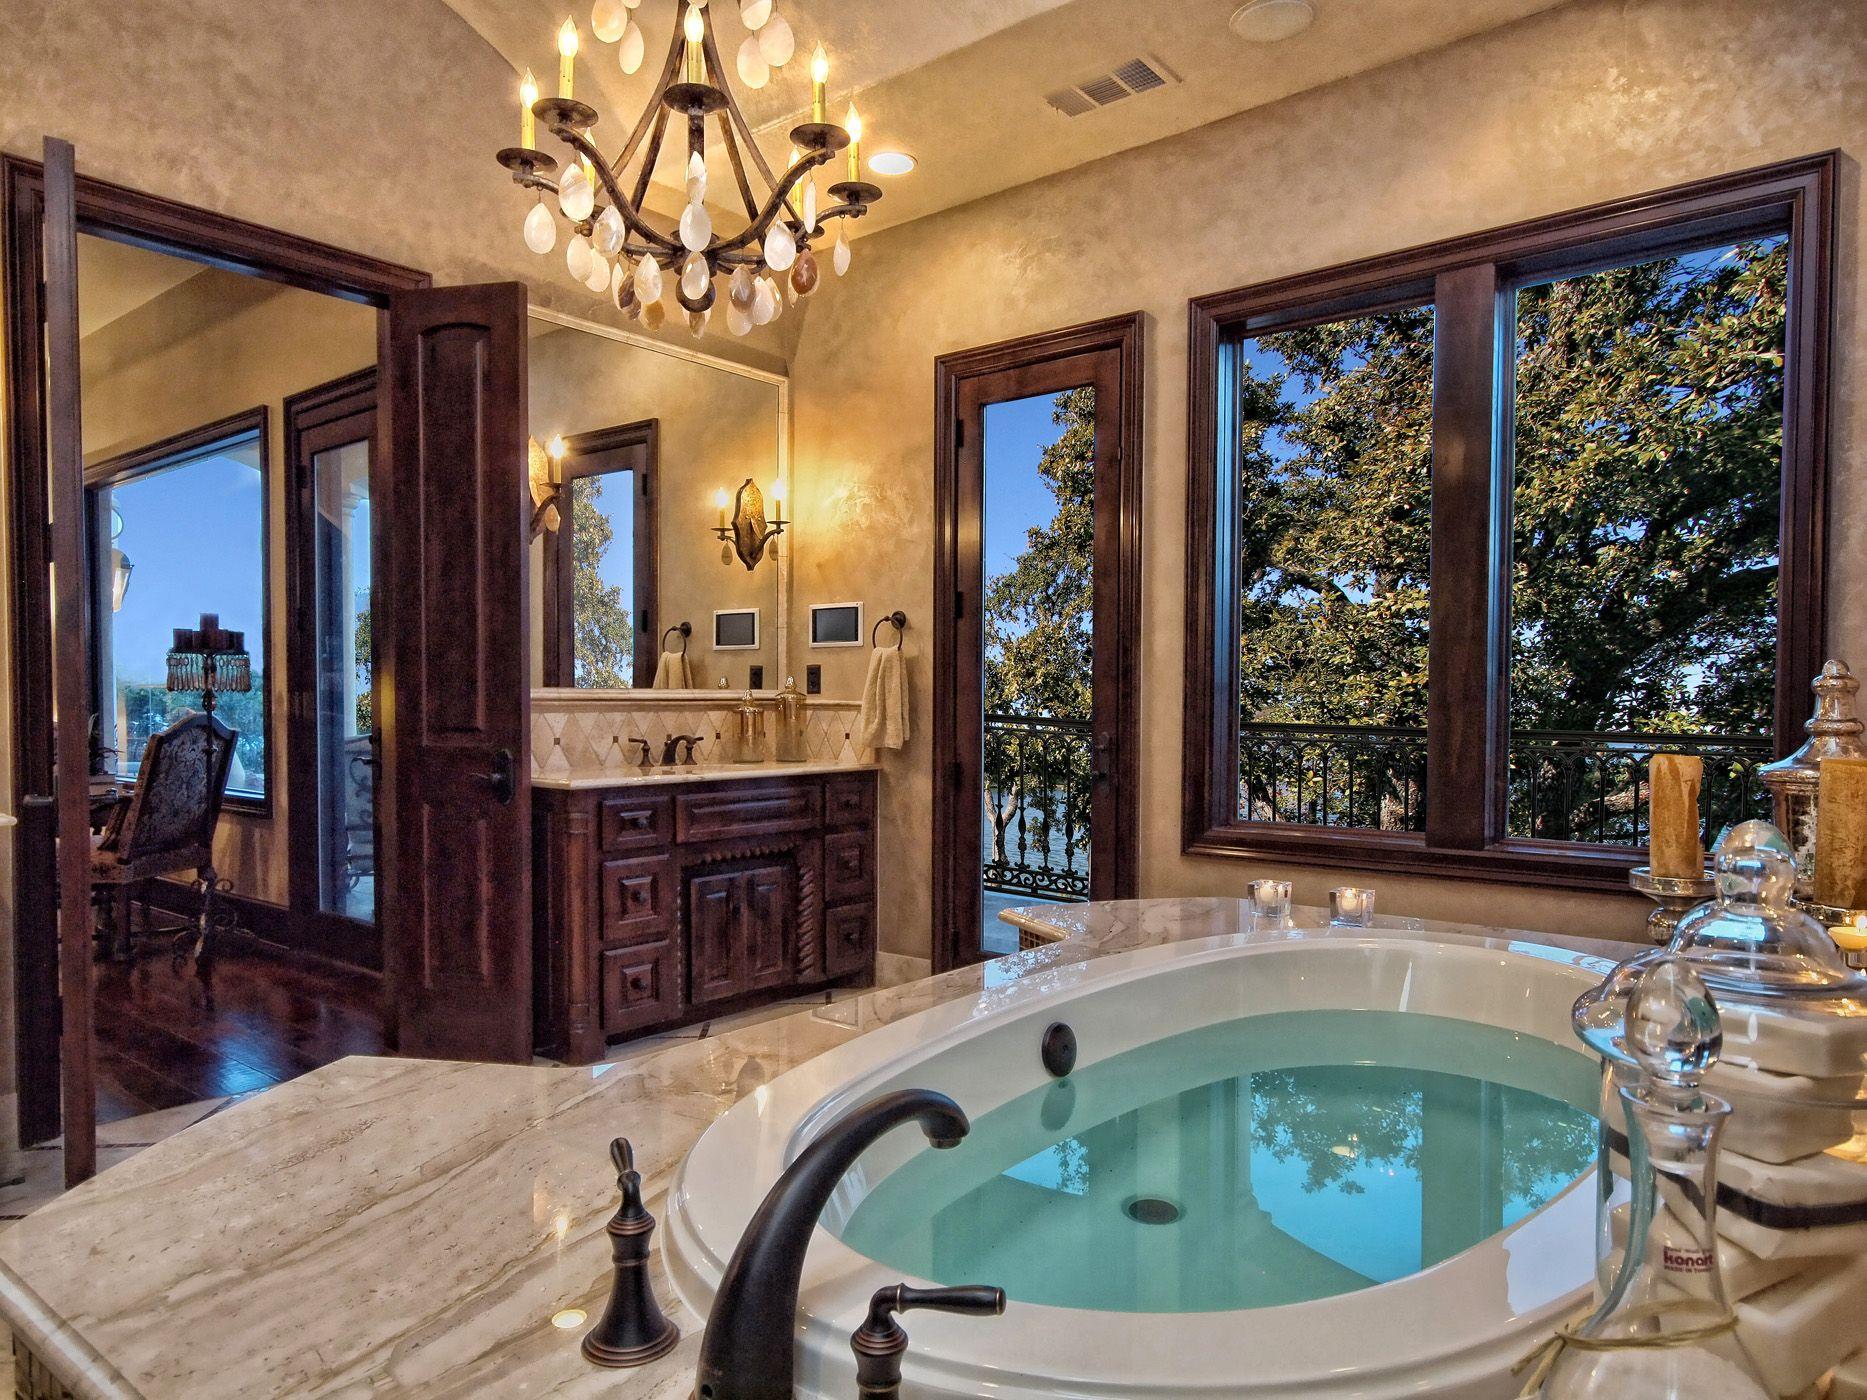 Delicieux Horseshoe Bay Mediterranean Style Master Bath By Zbranek U0026 Holt Custom  Homes, Austin And Horseshoe Bay New Home Builder